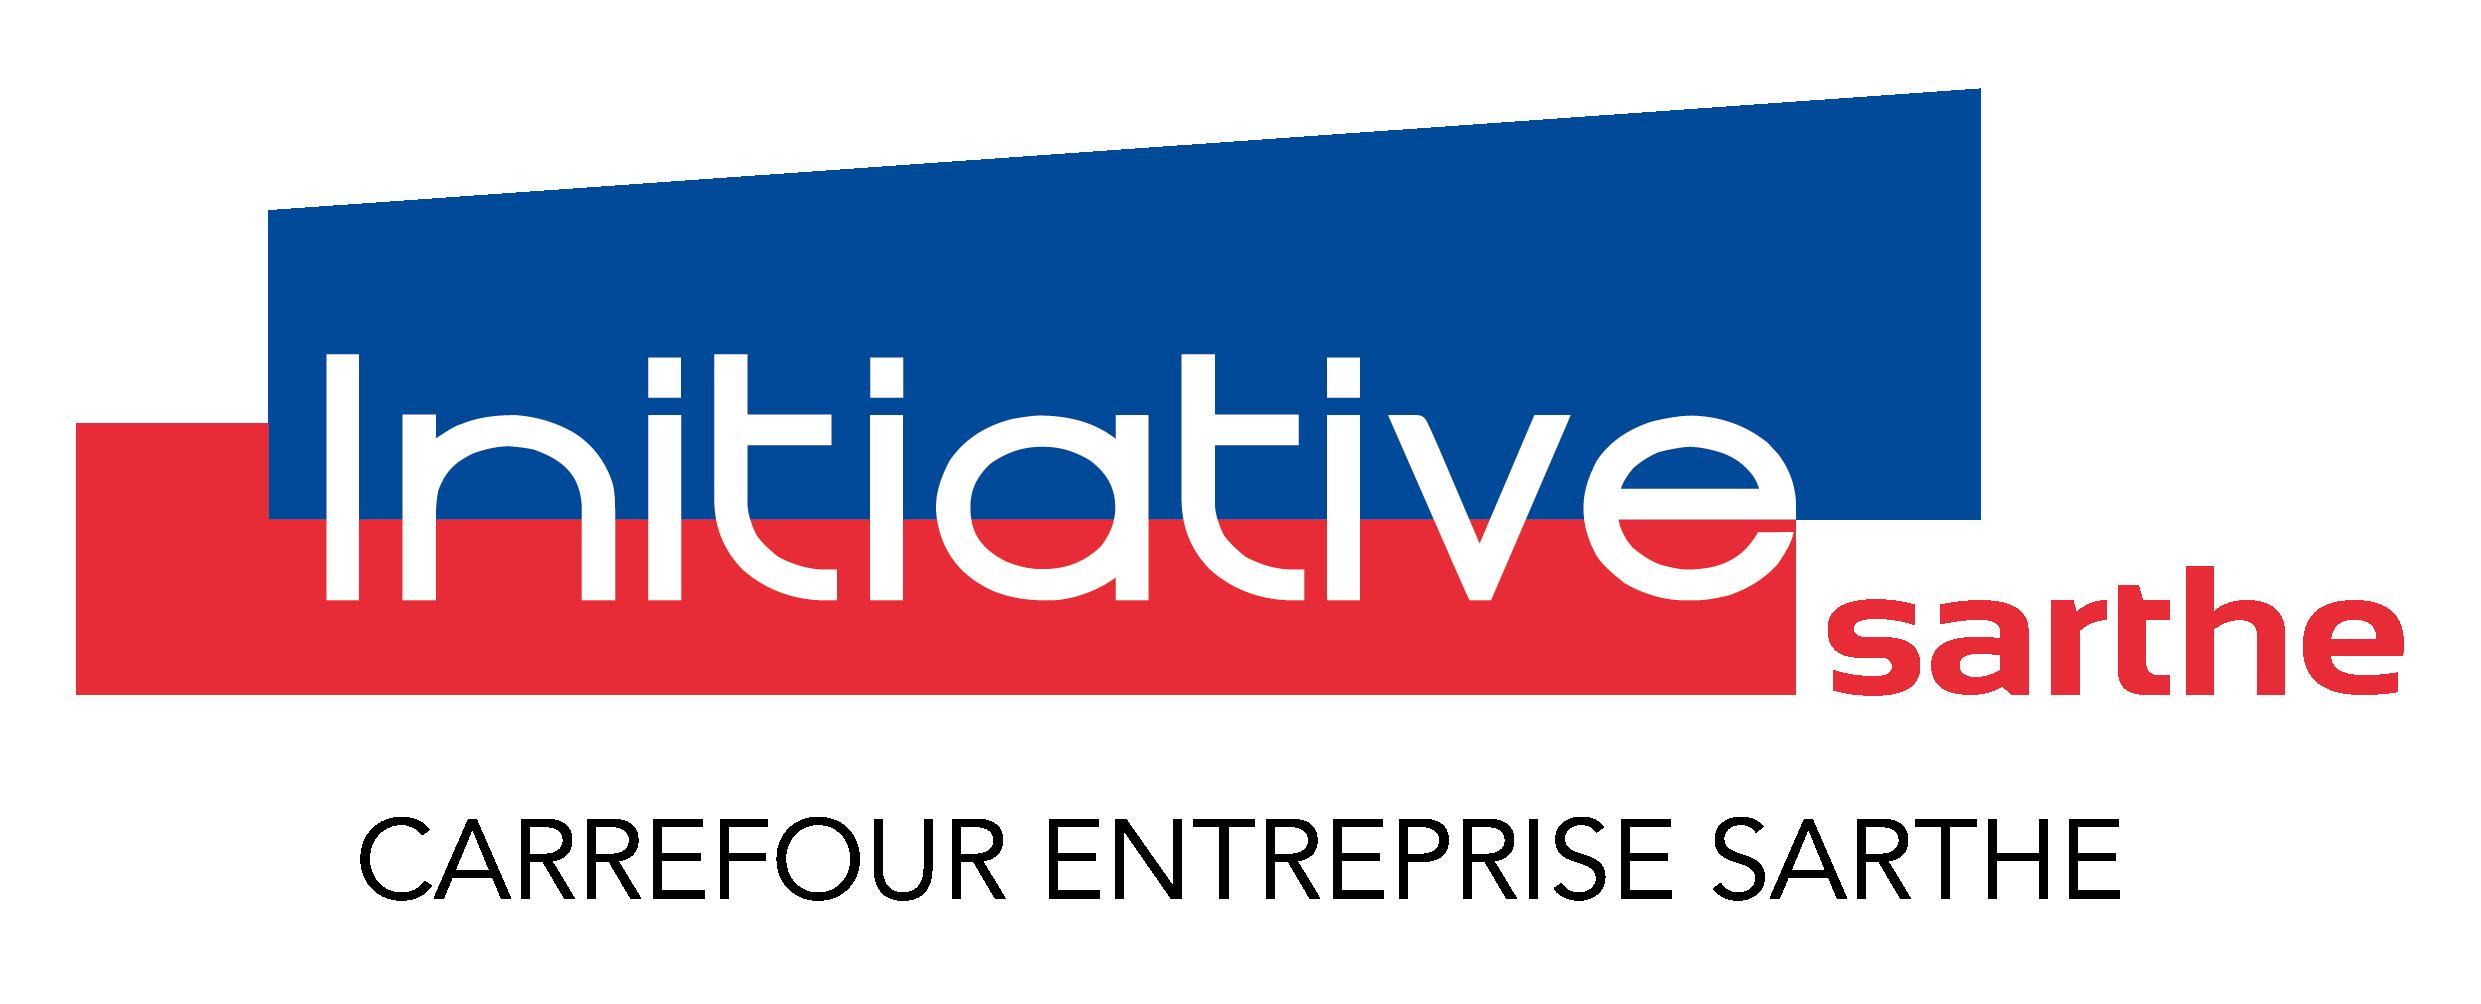 Initiative Sarthe – Carrefour Entreprise Sarthe Logo